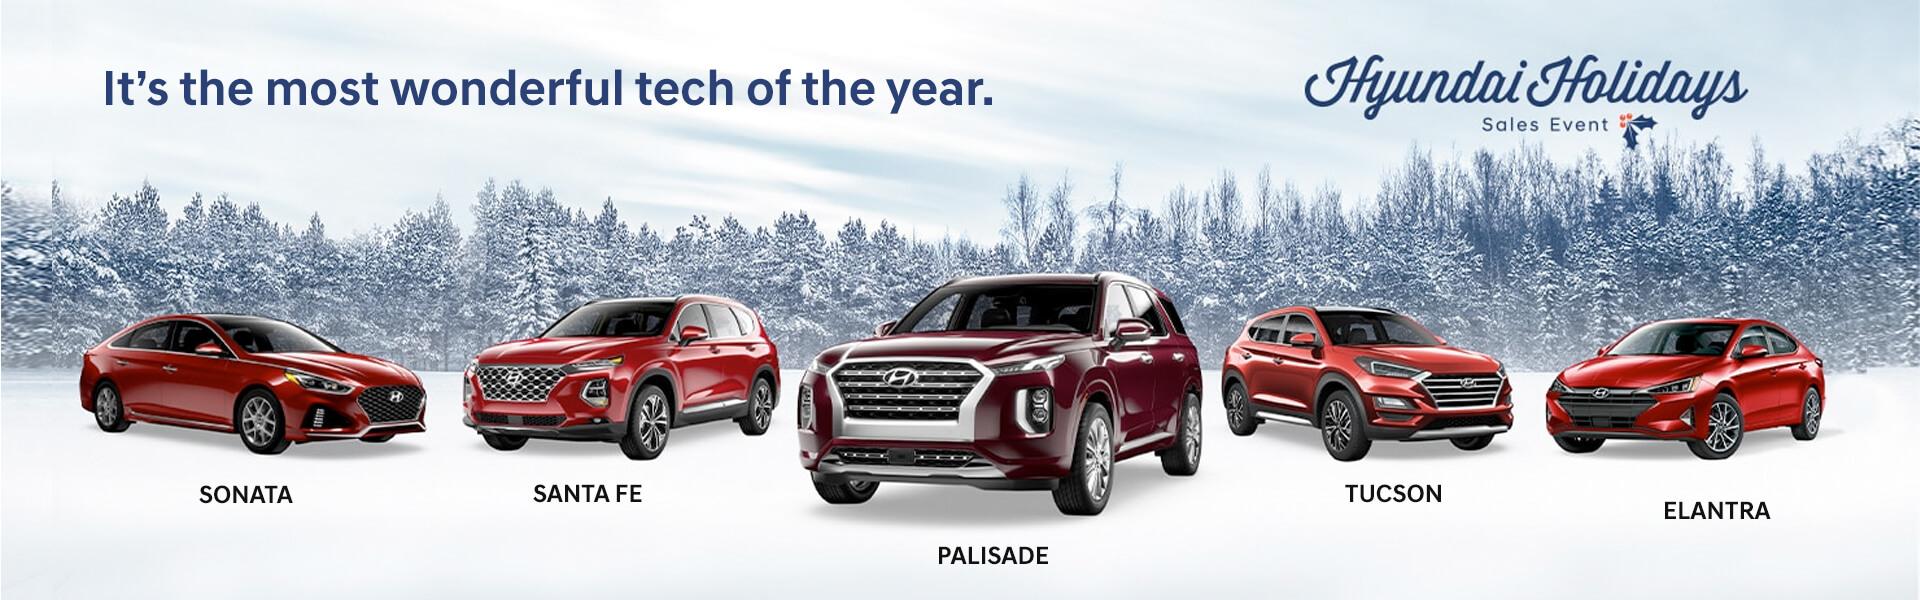 Hyundai Holiday Promo